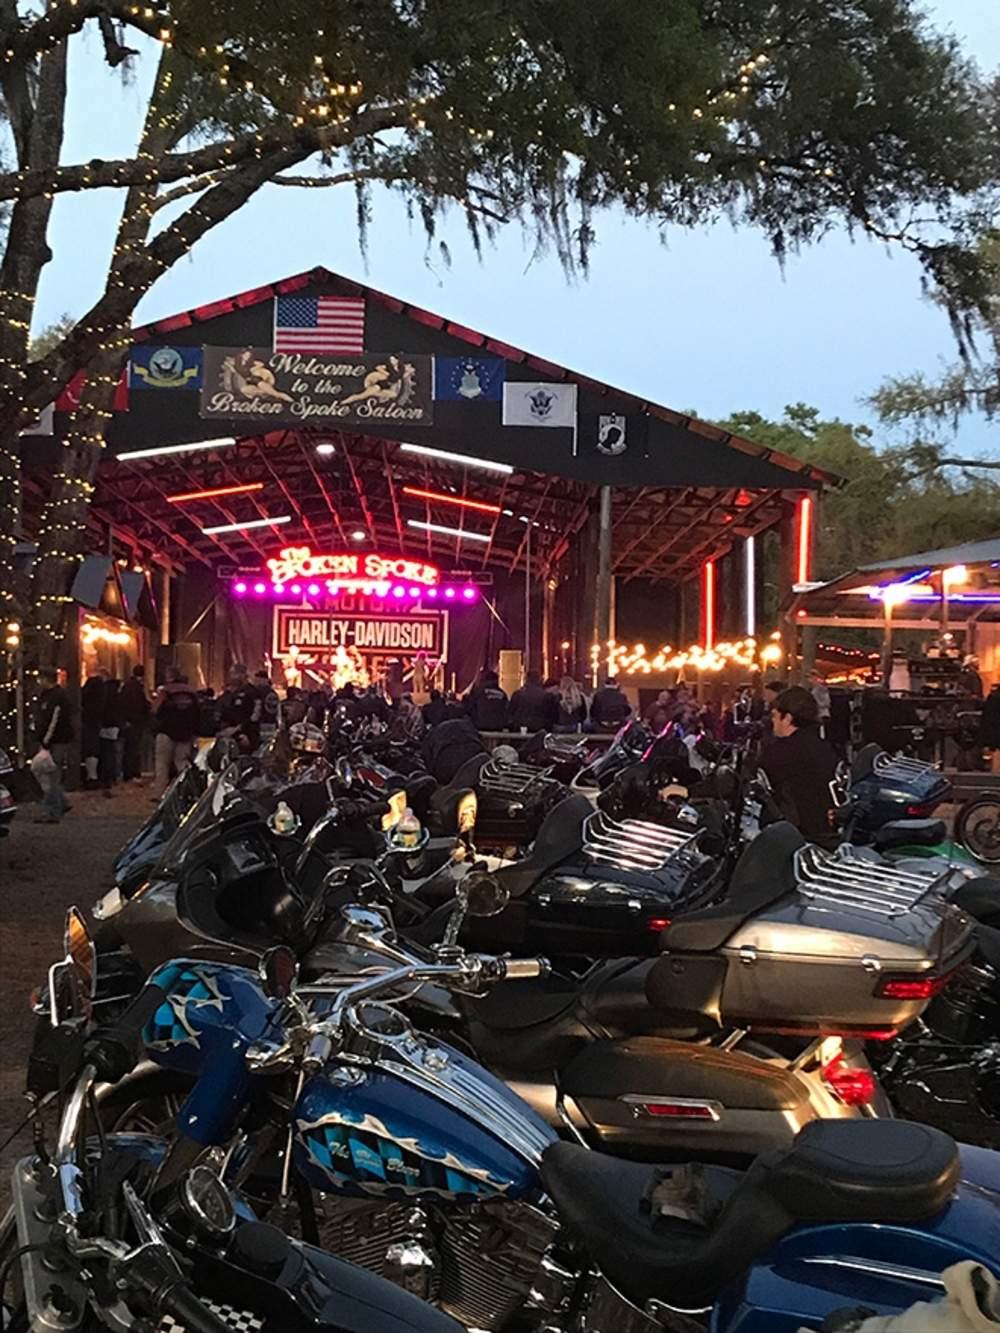 It's not Daytona Bike Week without a visit to the Broken Spoke Saloon. (Jordan Mastagni)